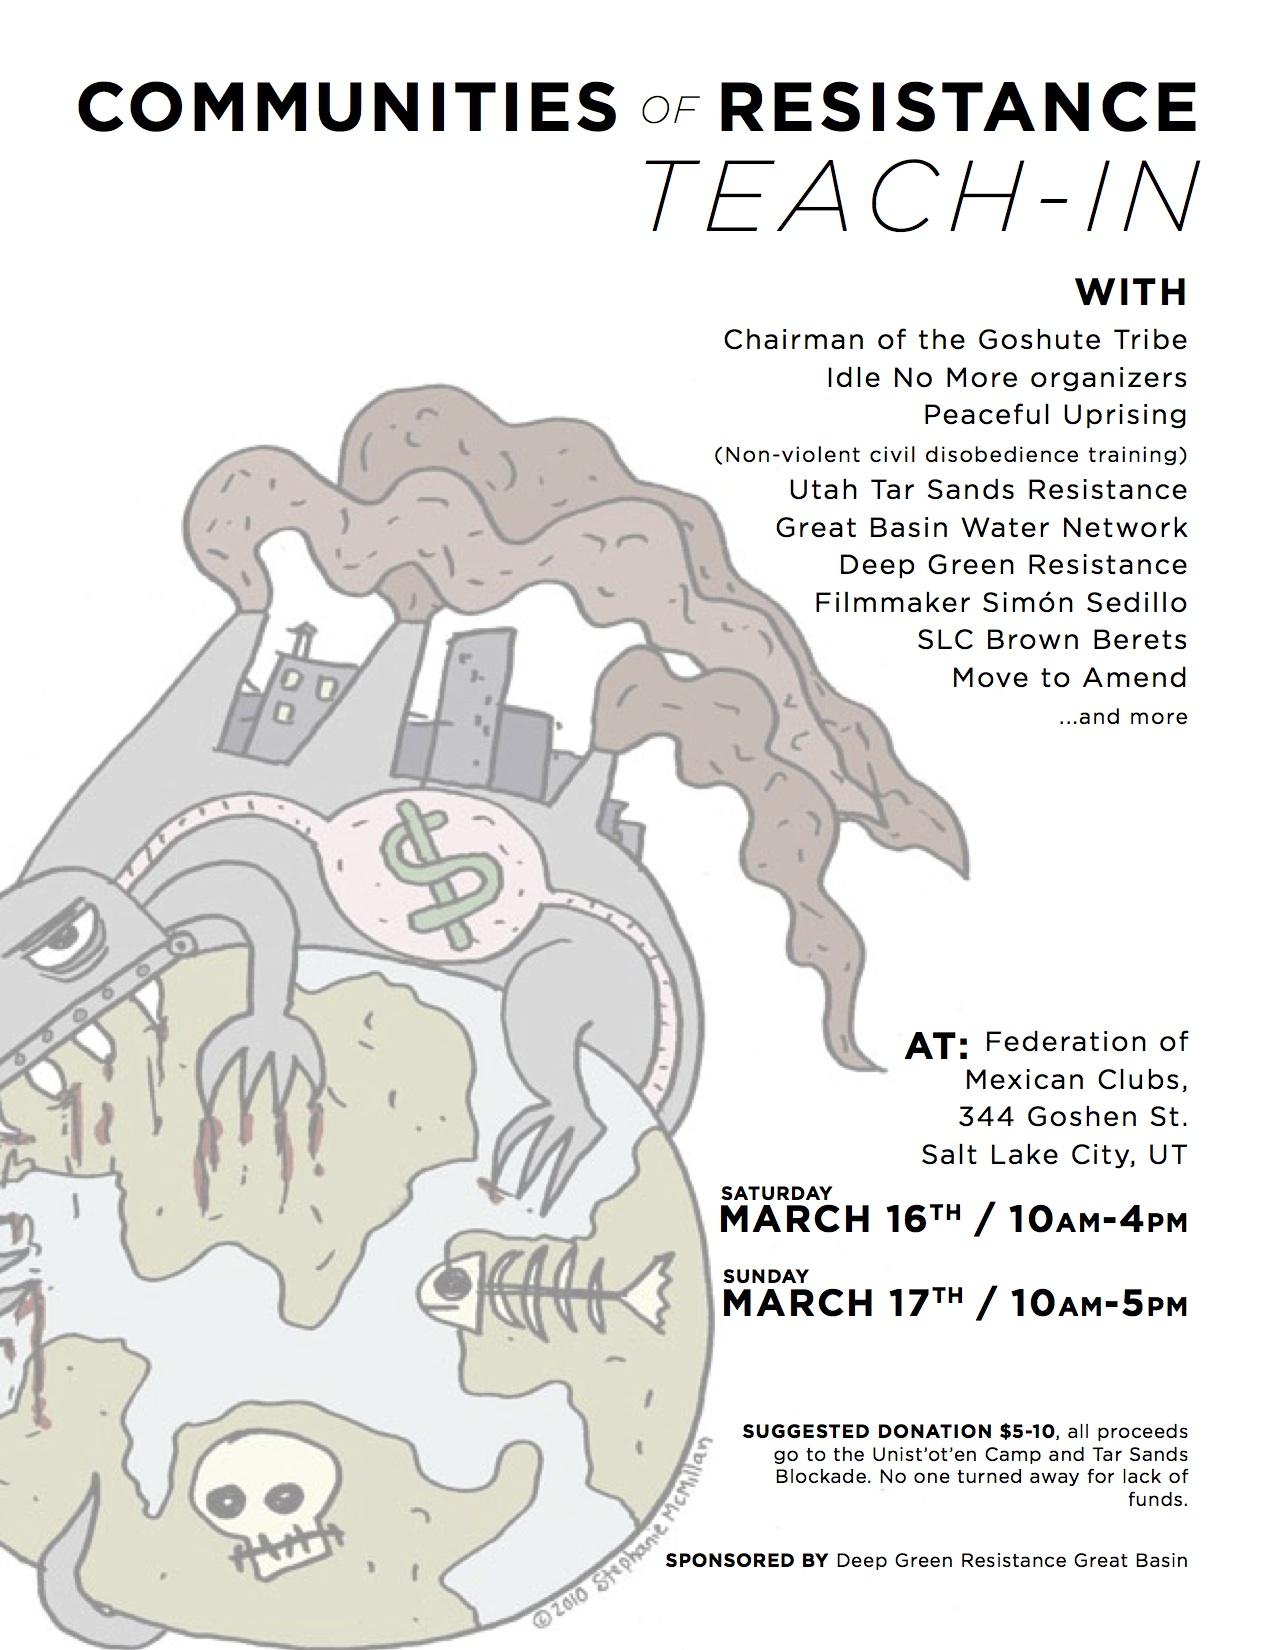 Communities of Resistance Teach-in